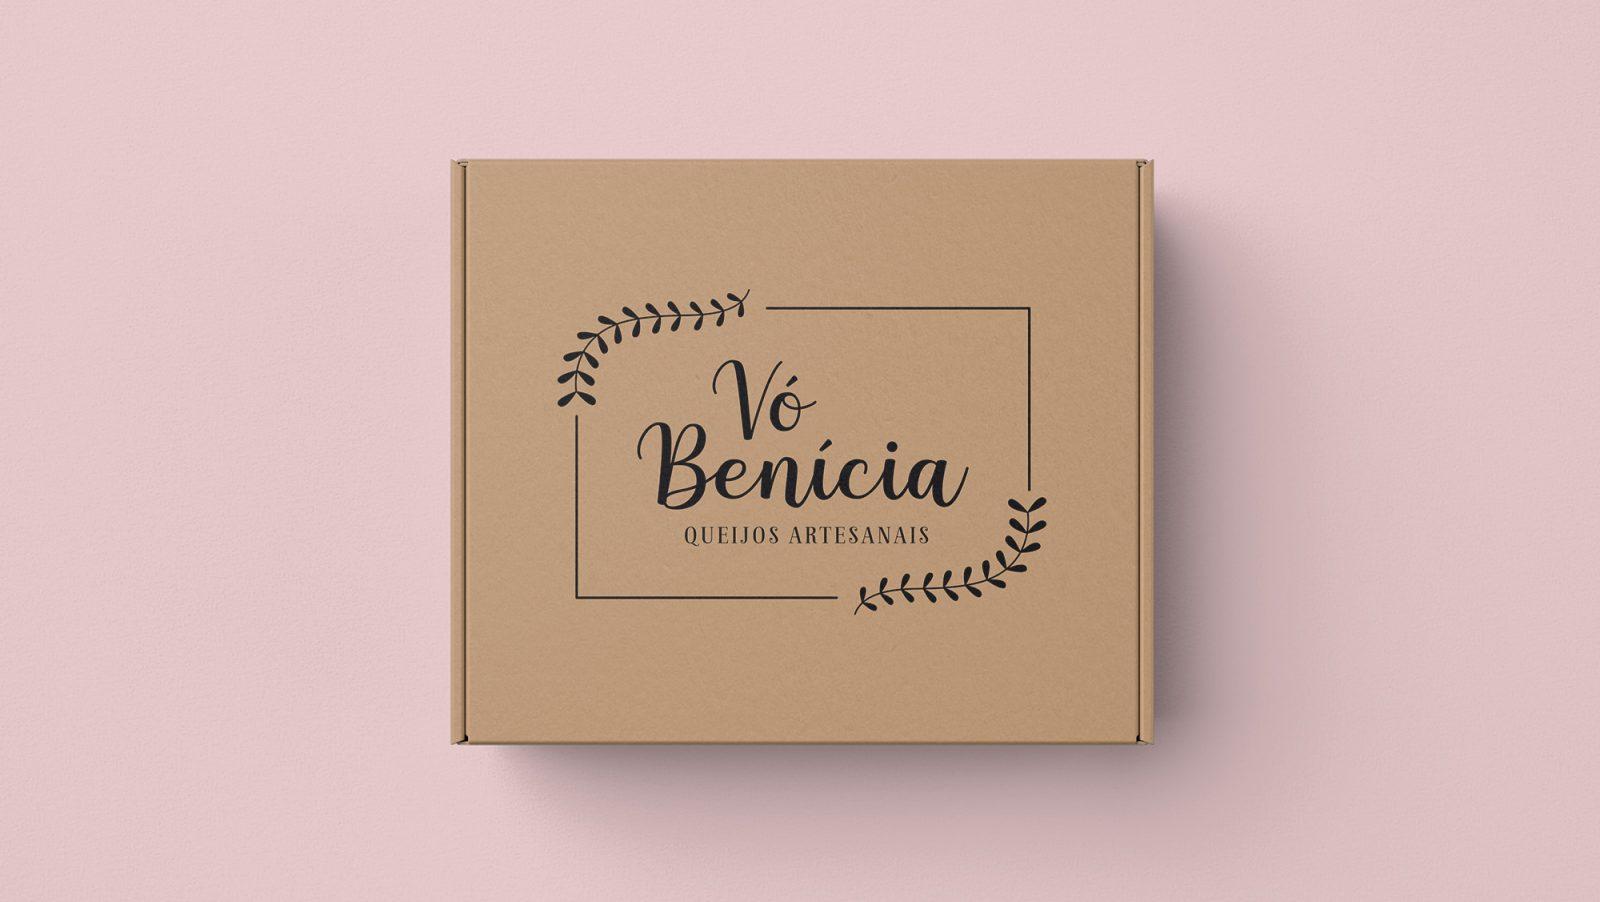 Vó Benícia